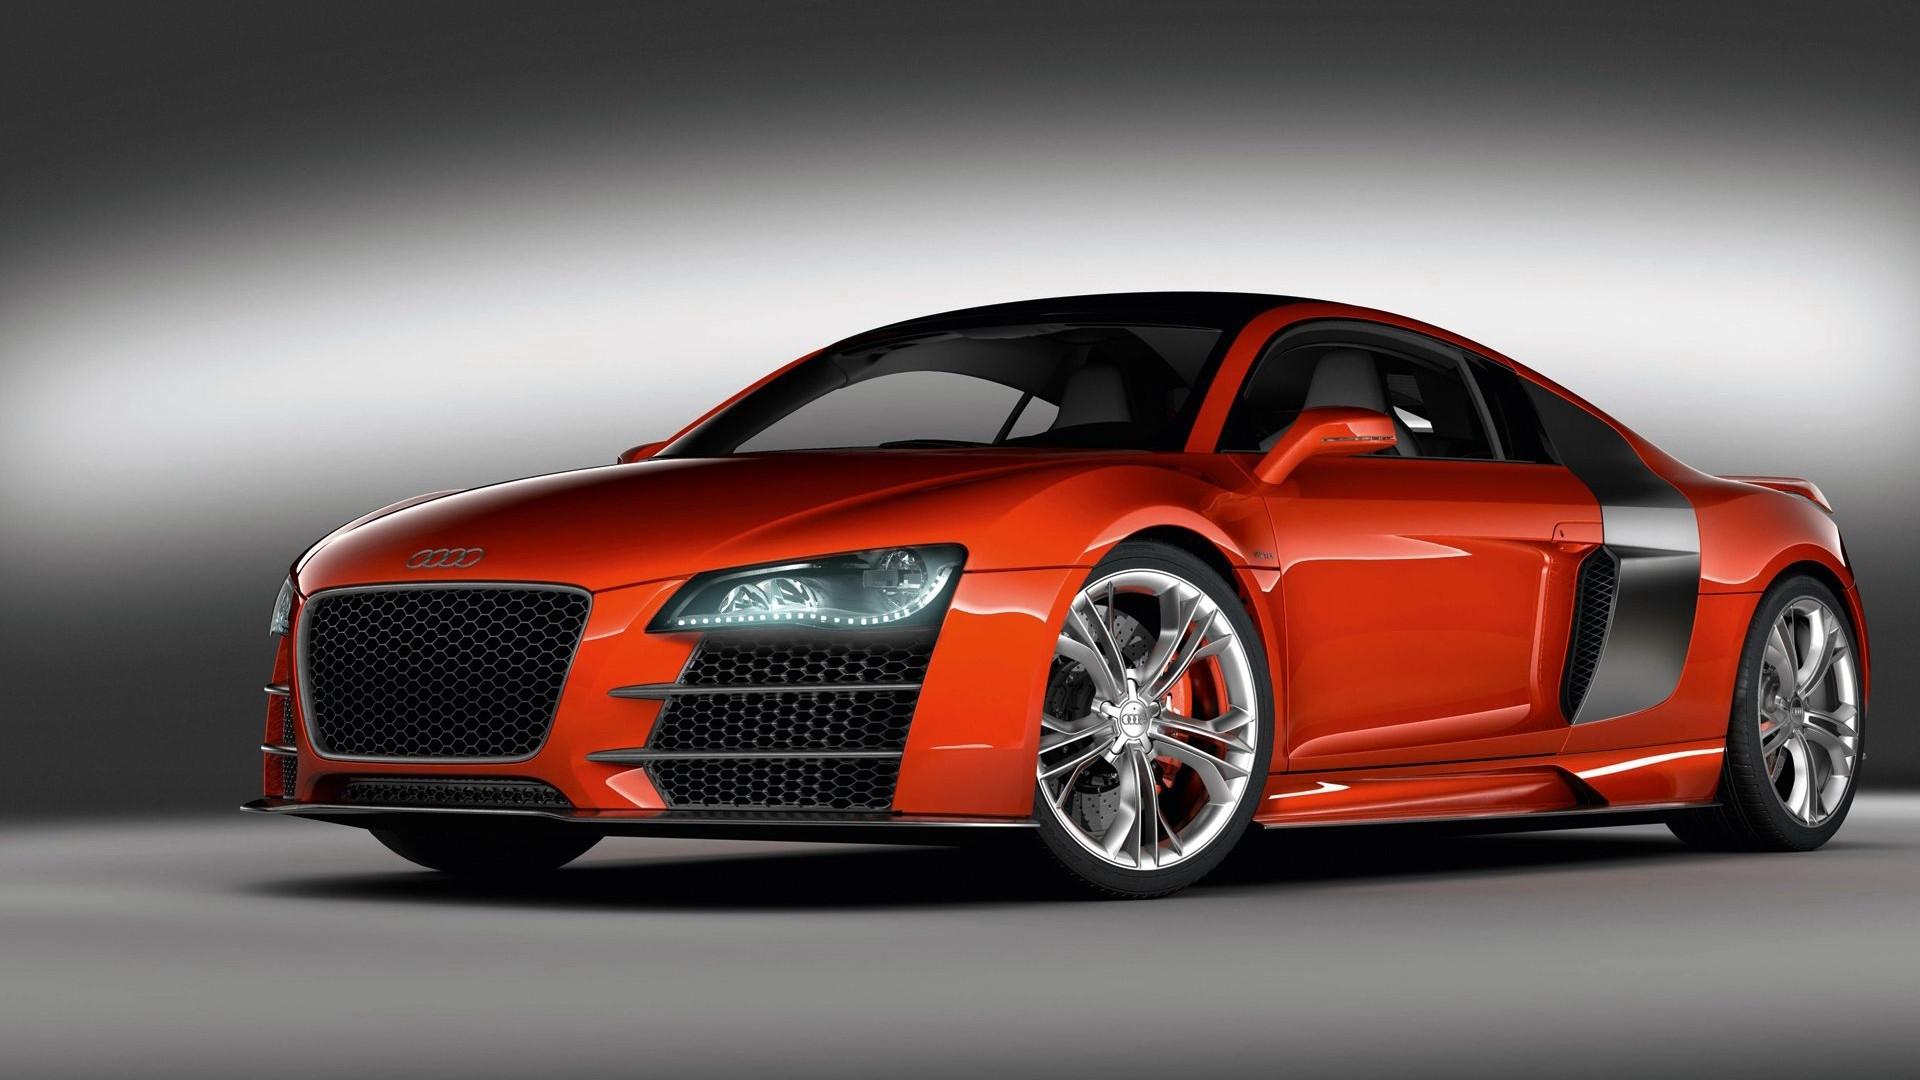 Audi R8 1080p Wallpapers | HD Wallpapers